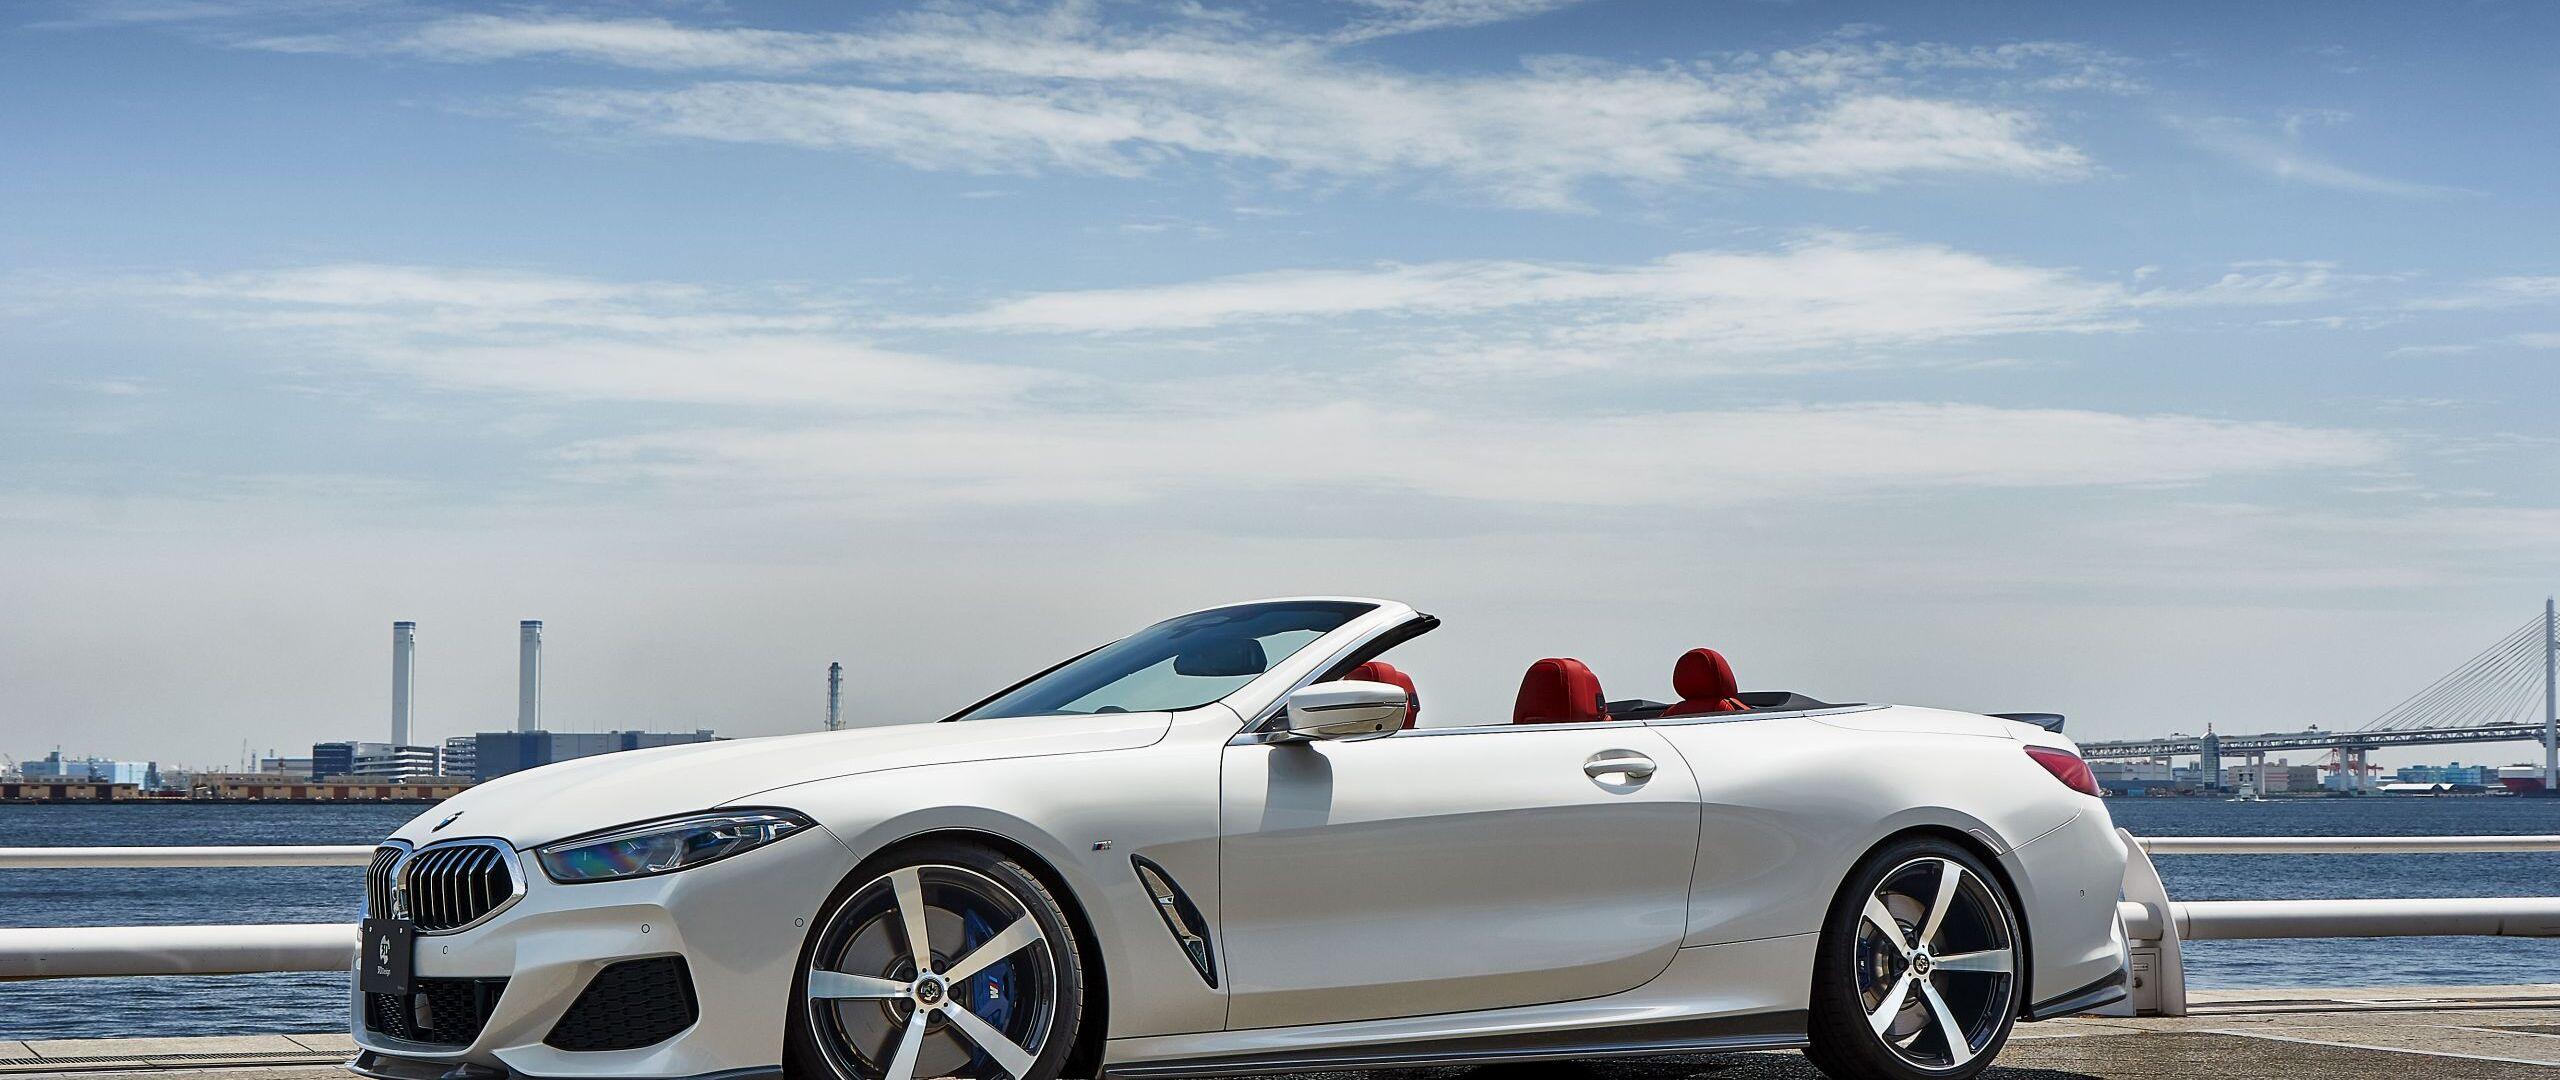 2560x1080 BMW M850i XDrive Cabrio 2020 2560x1080 ...